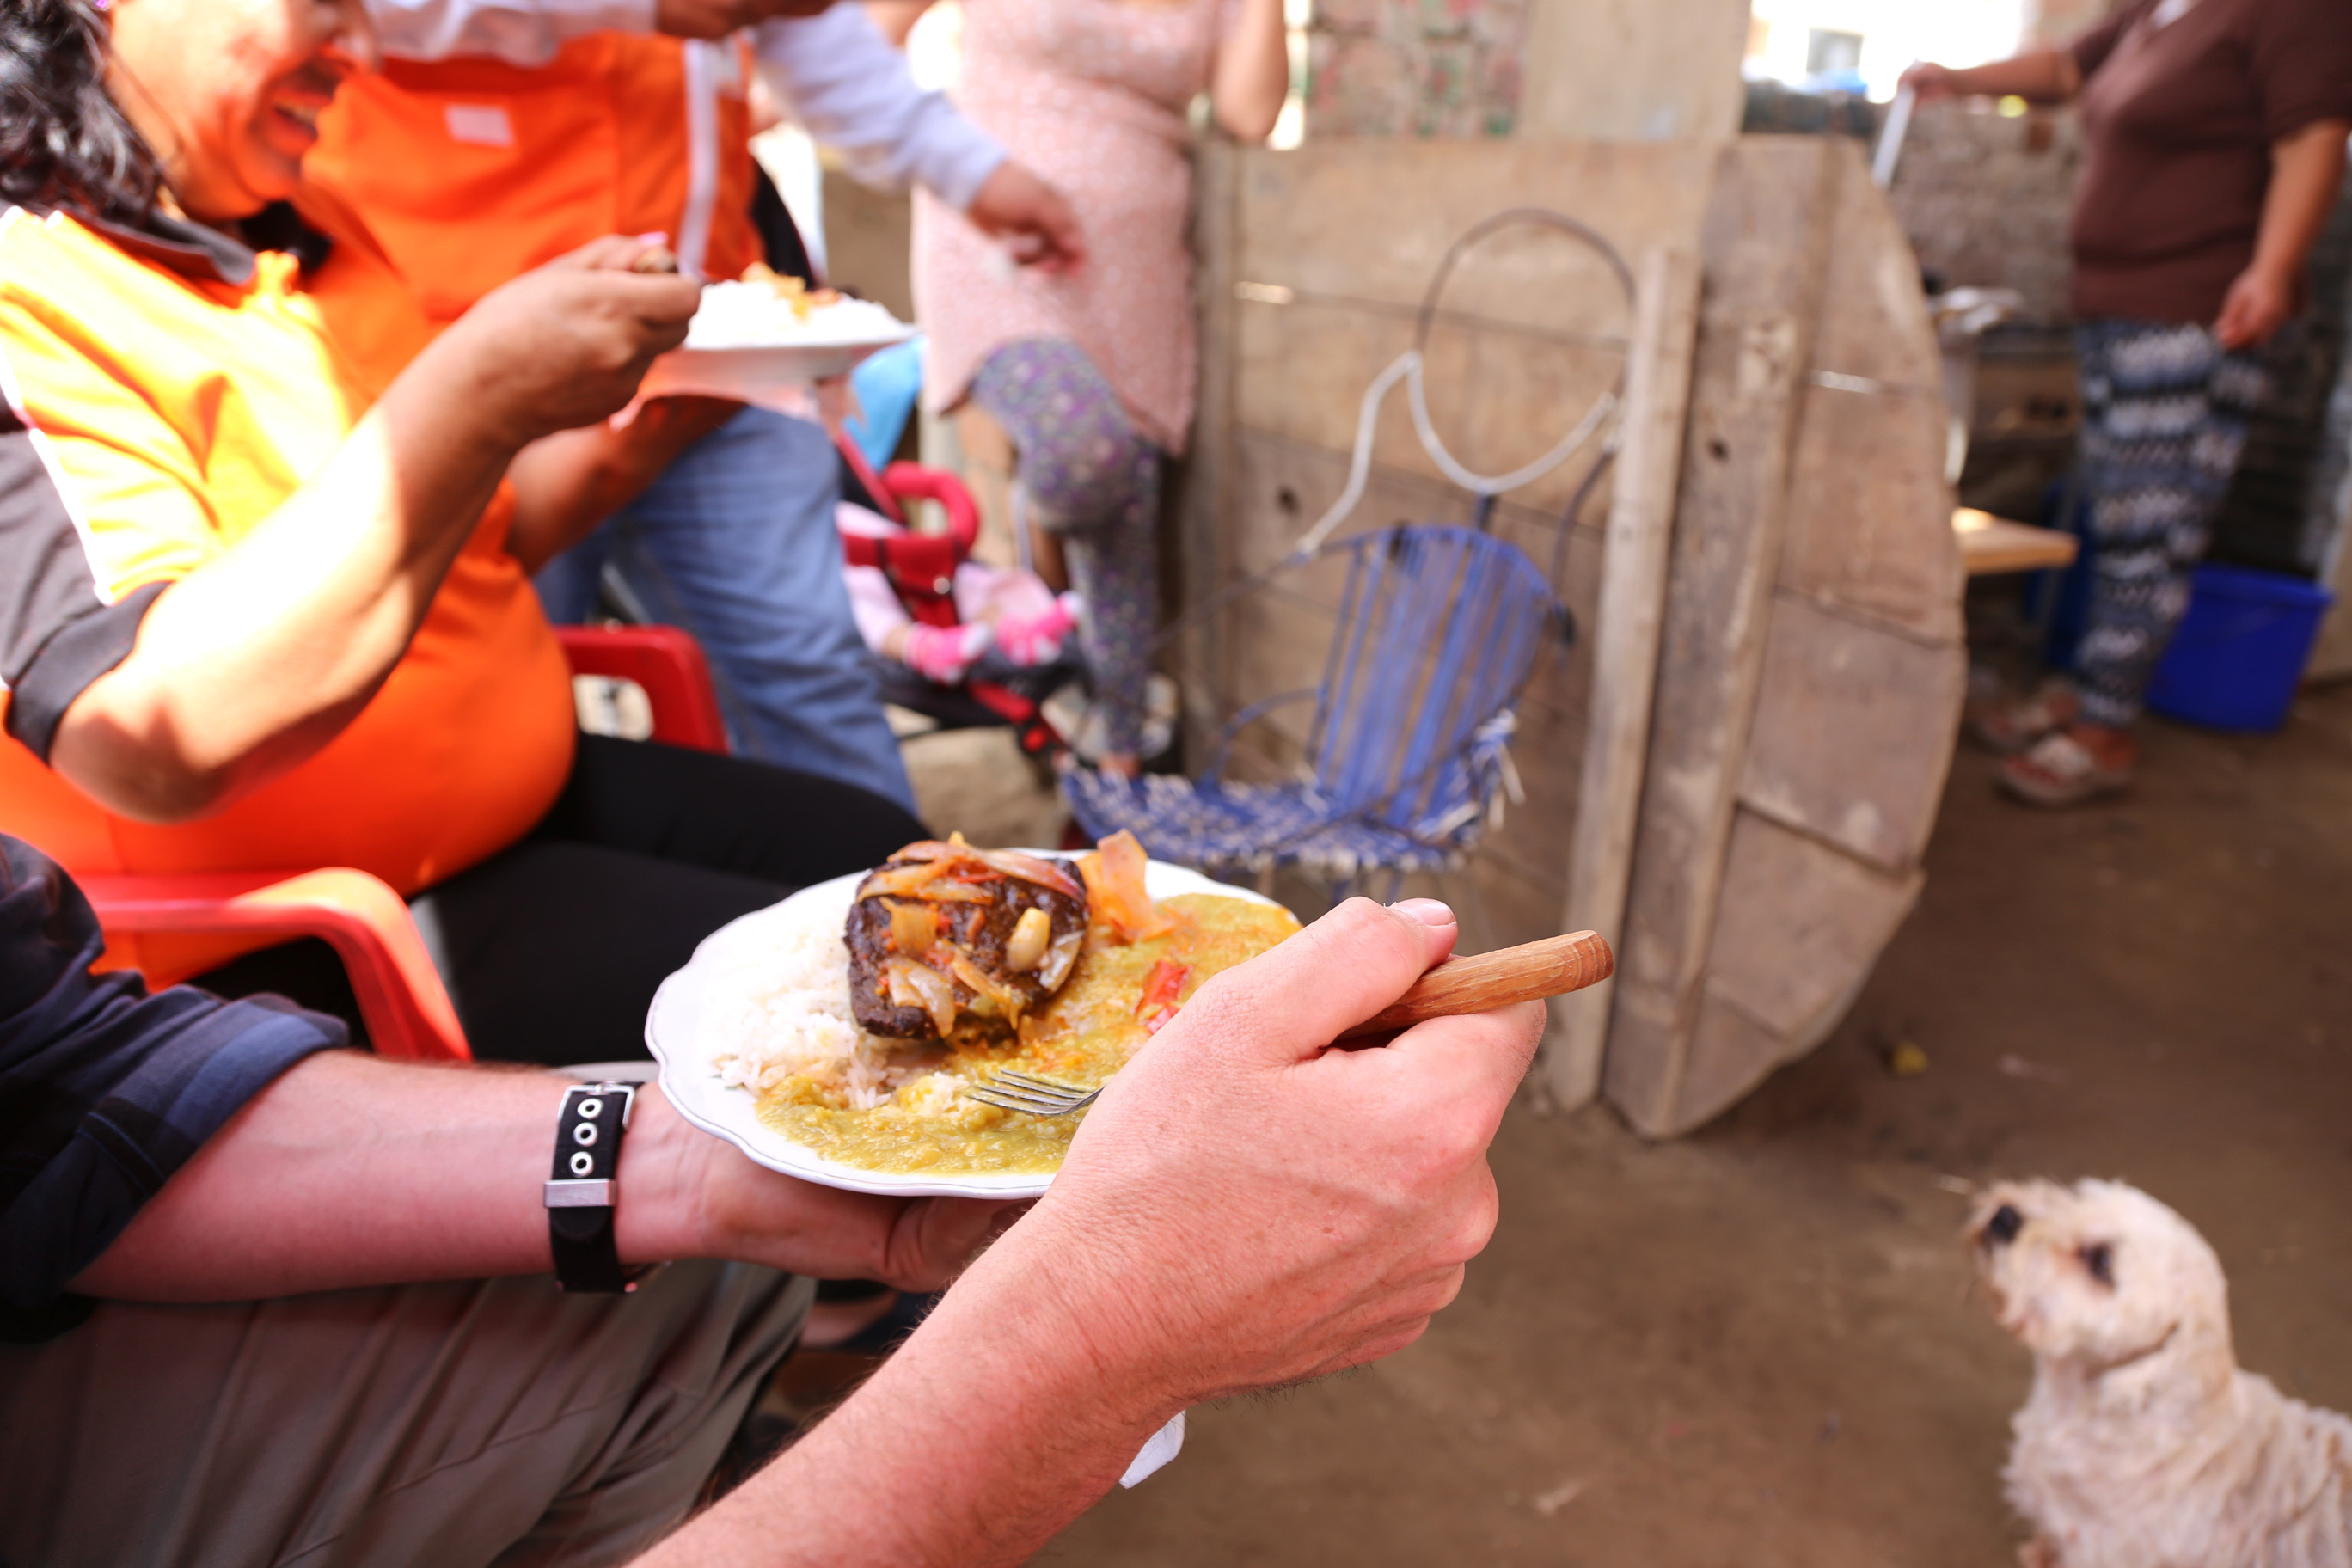 PERU: Yolanda Enriquez's story (food)